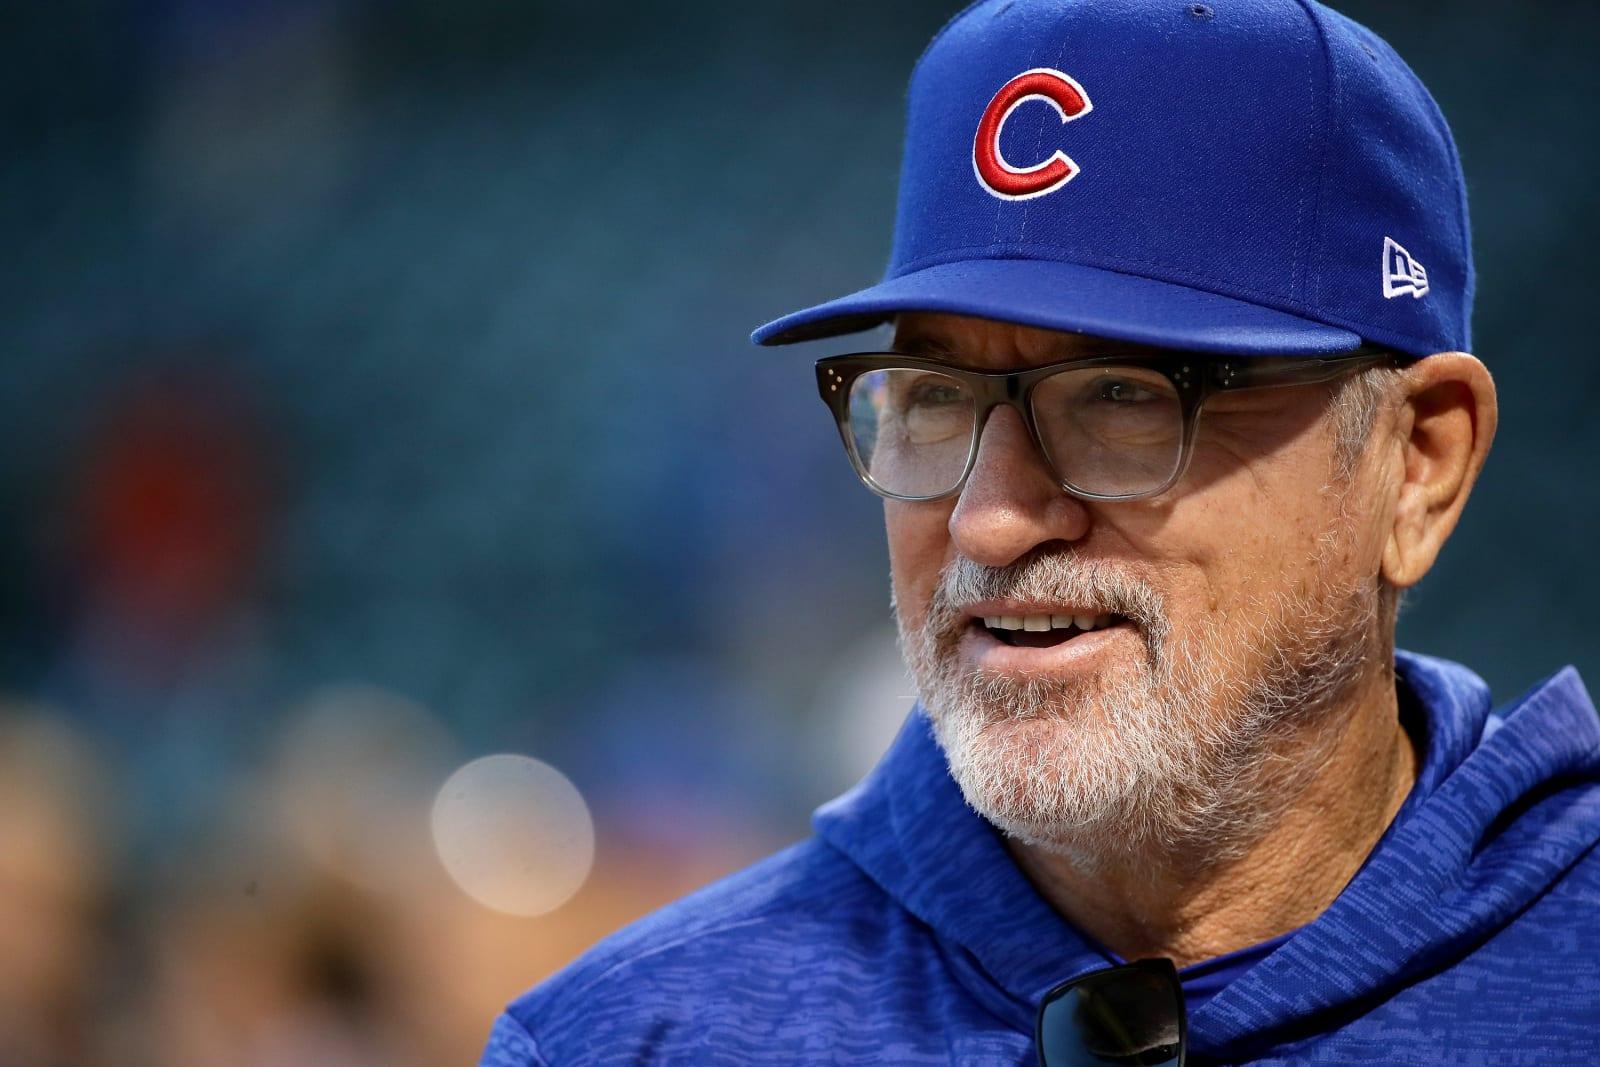 Chicago Cubs Joe Maddon